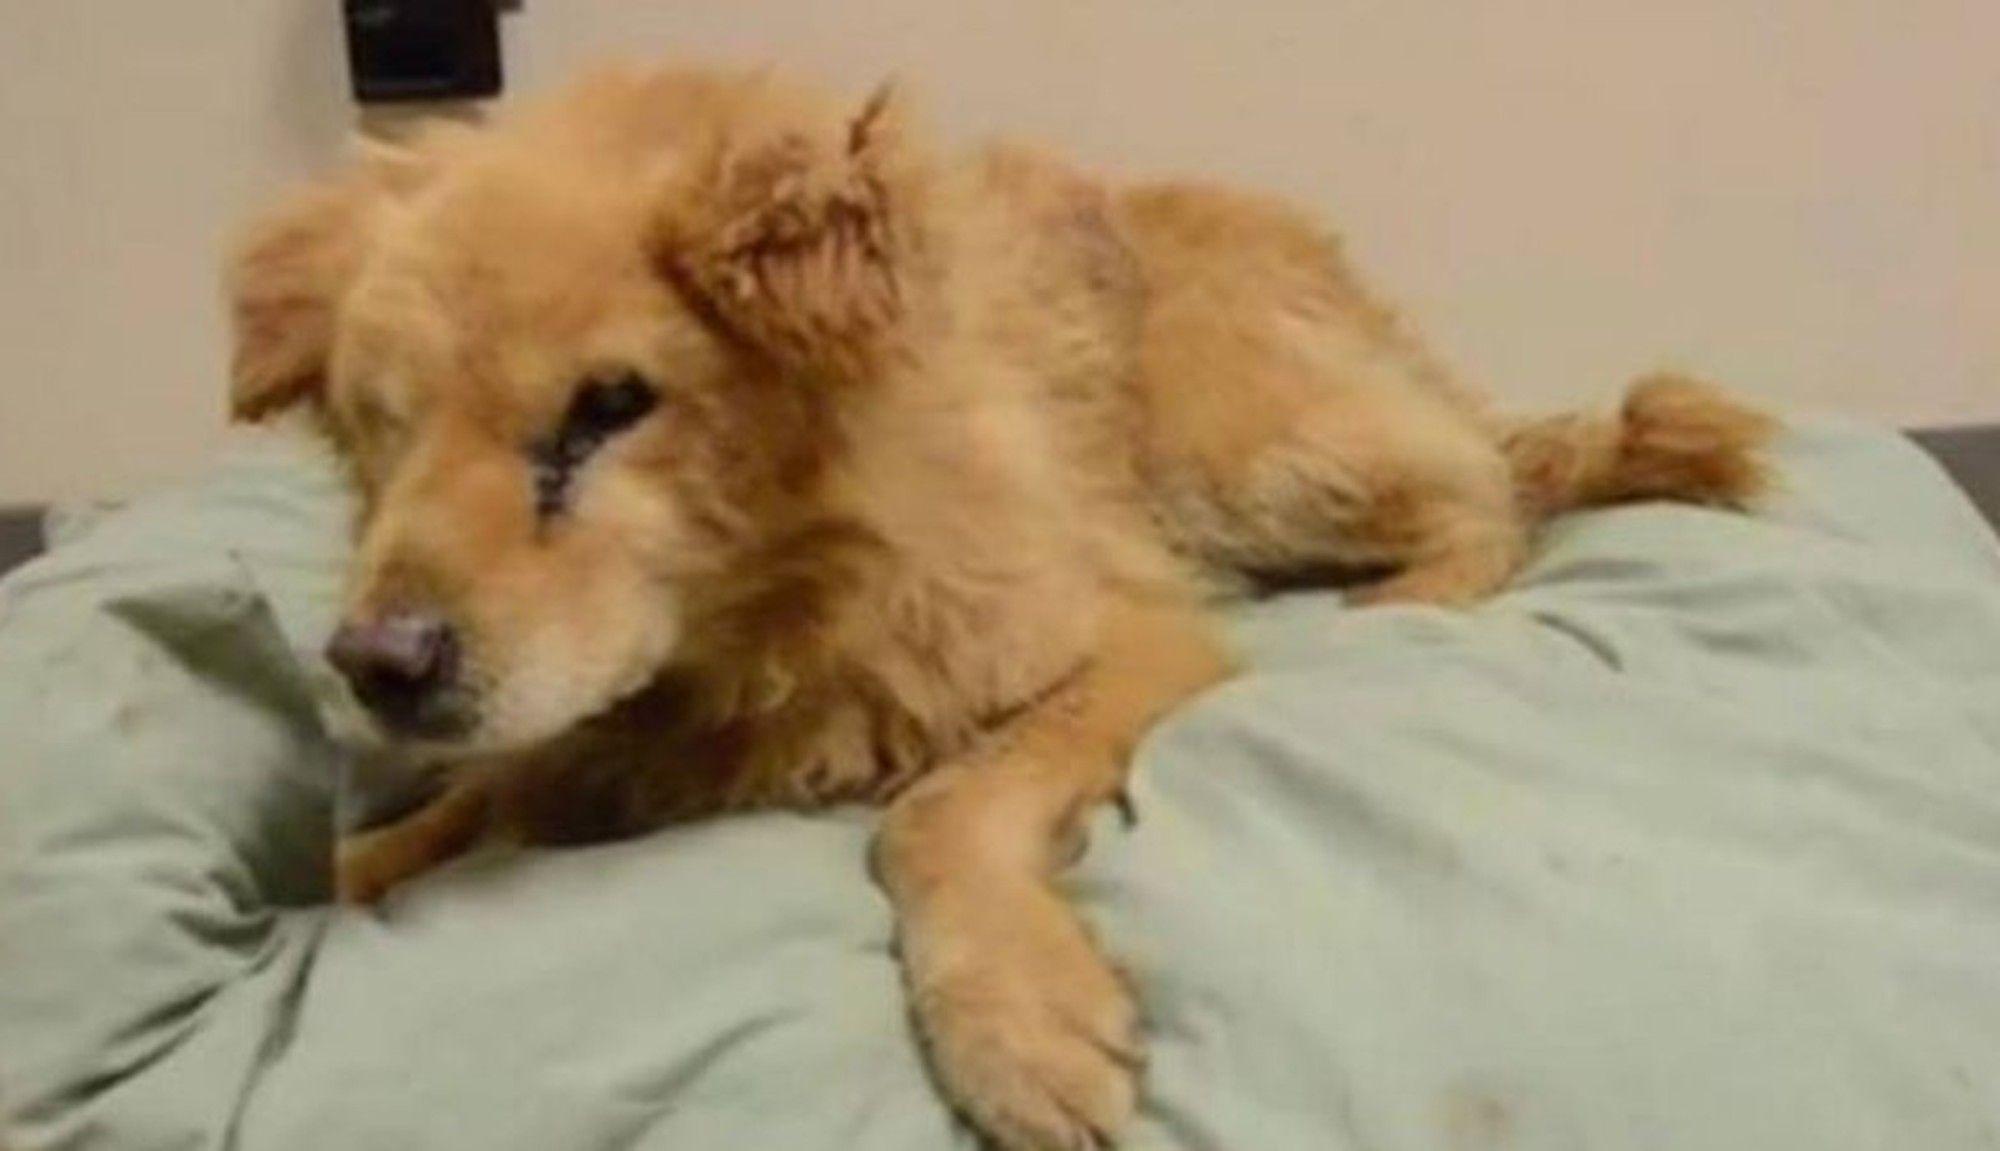 Blind, Deaf Dog Is So Scared In Shelter After His Owner Dies